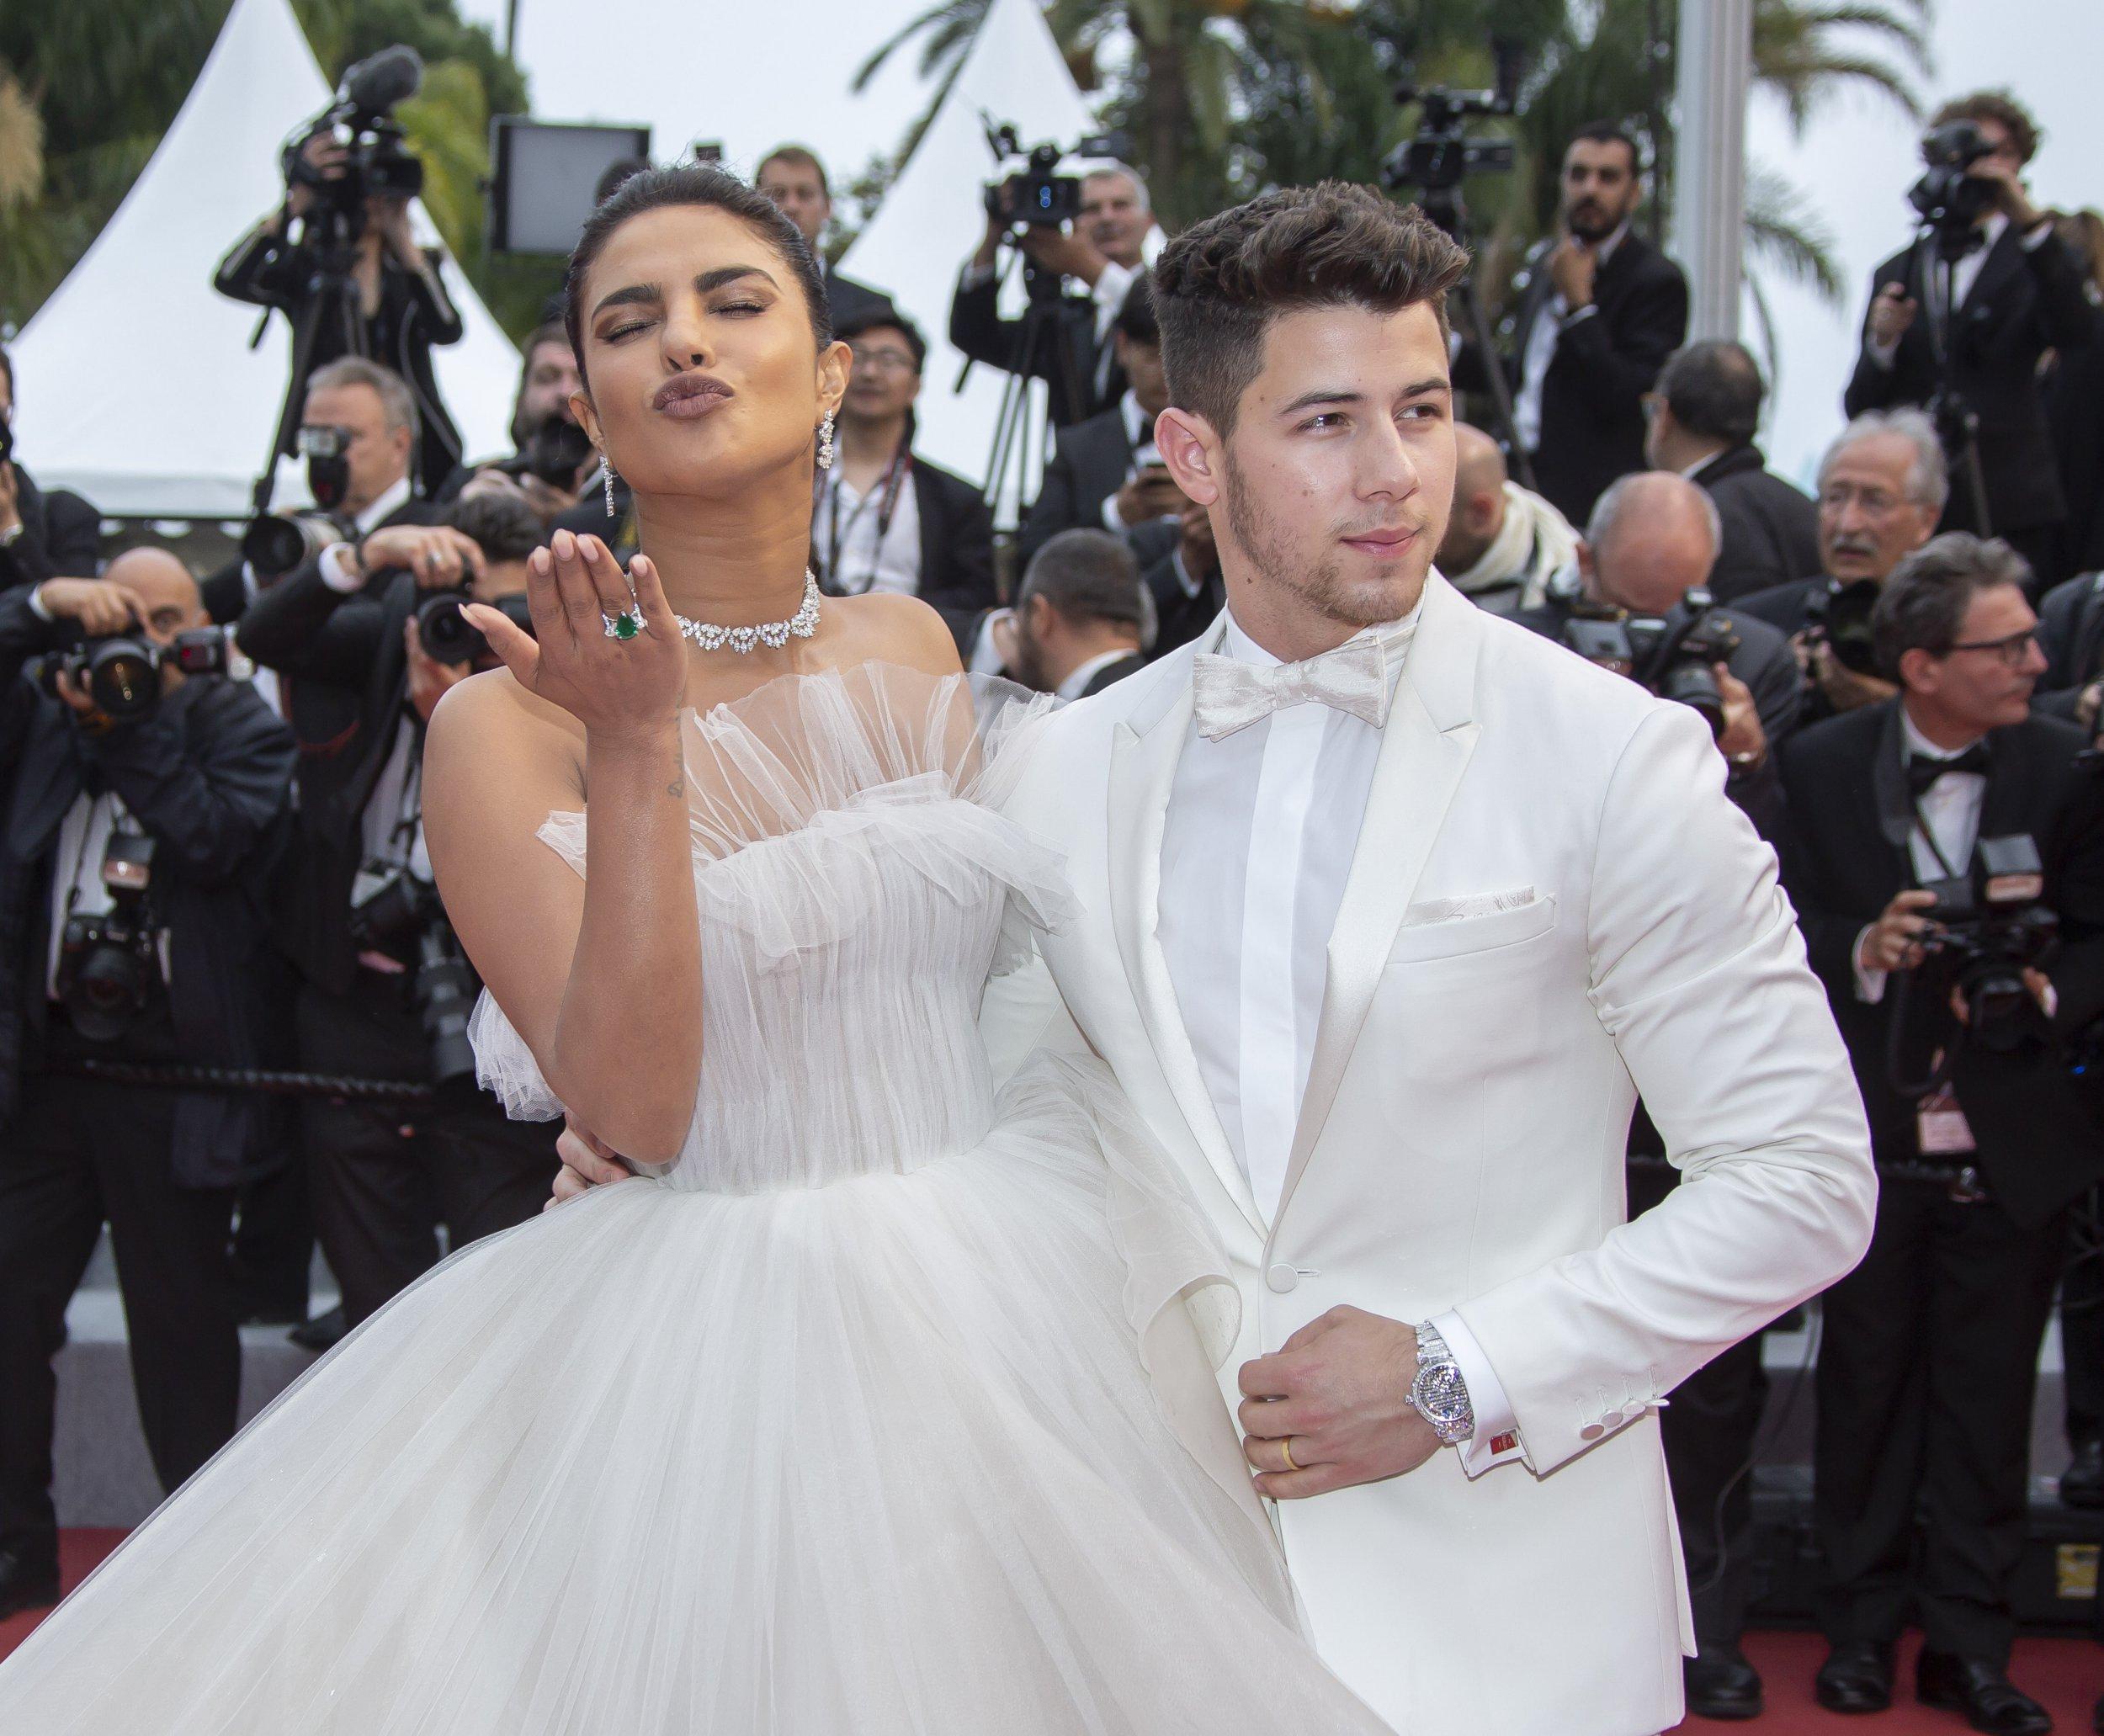 Nick Jonas posts adorable tribute to wife Priyanka Chopra: 'I am honoured to be your husband'